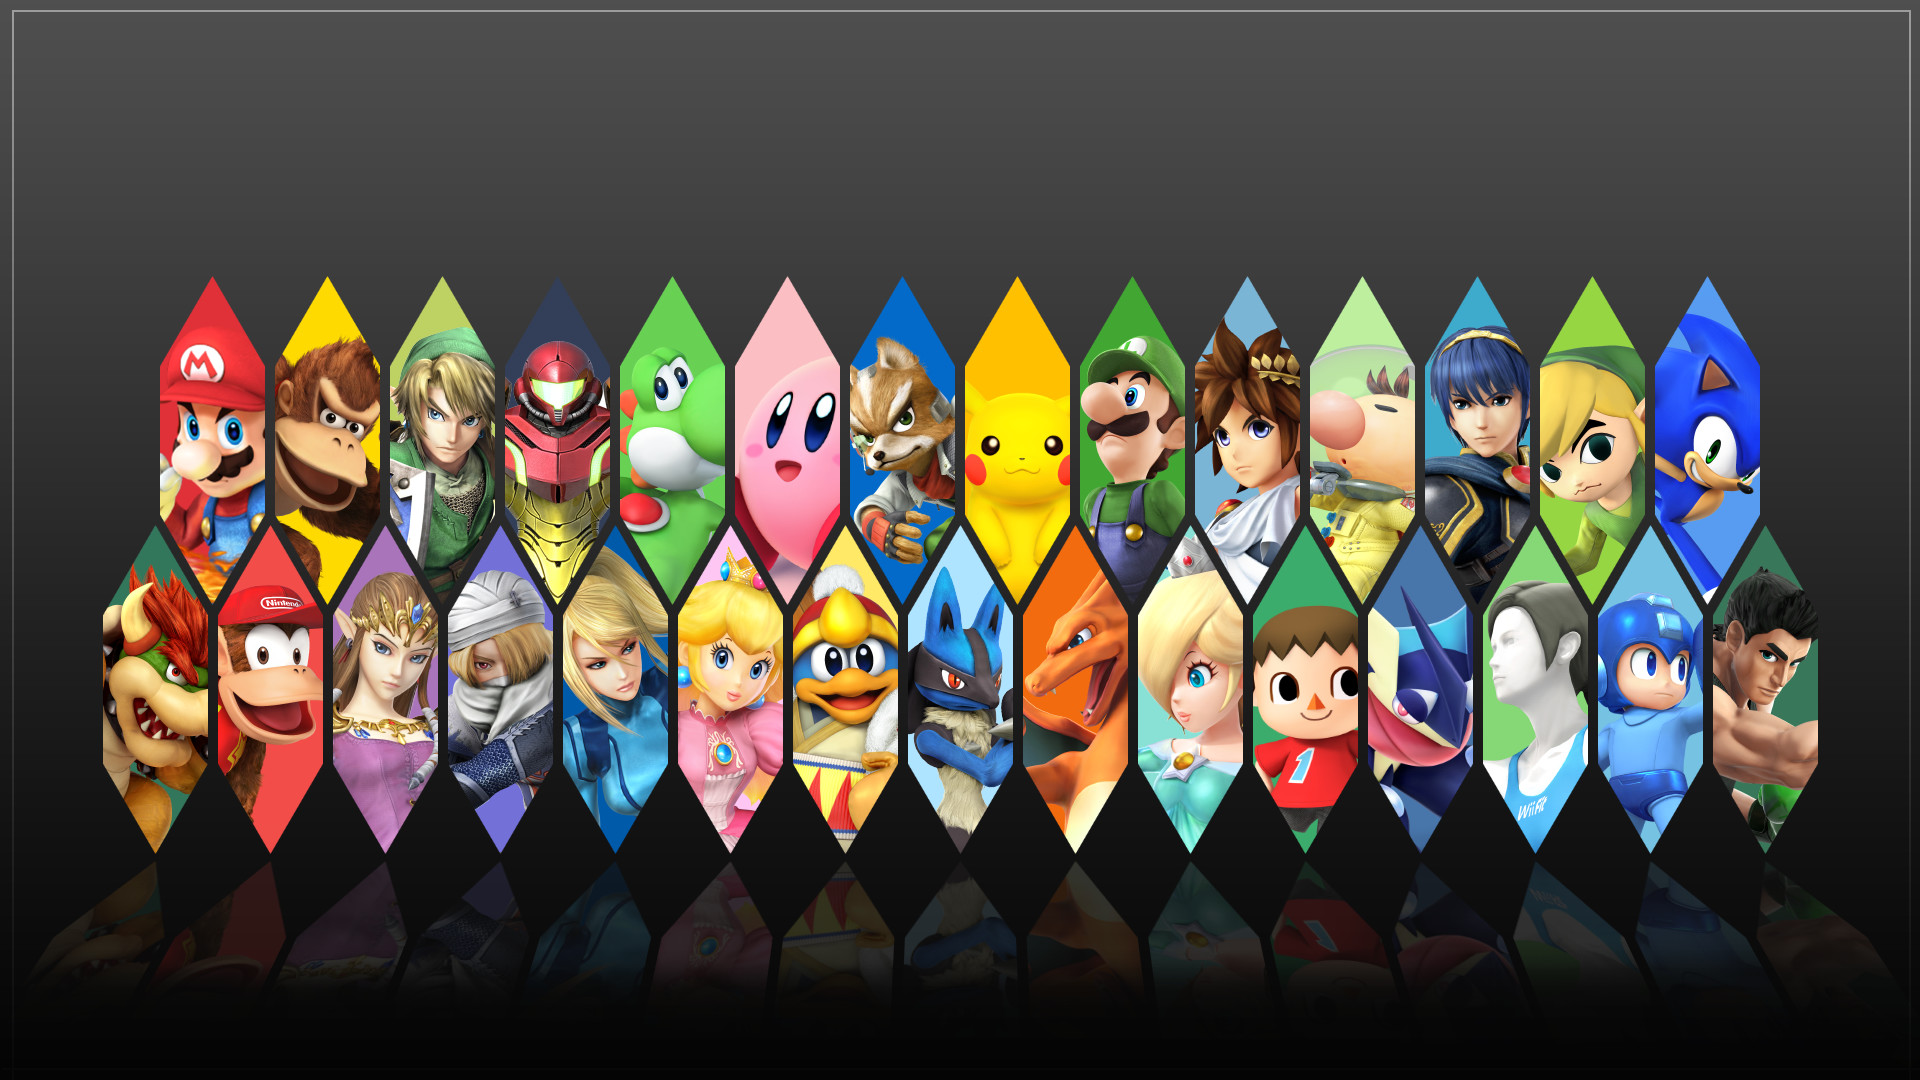 Super smash bros 4 characters